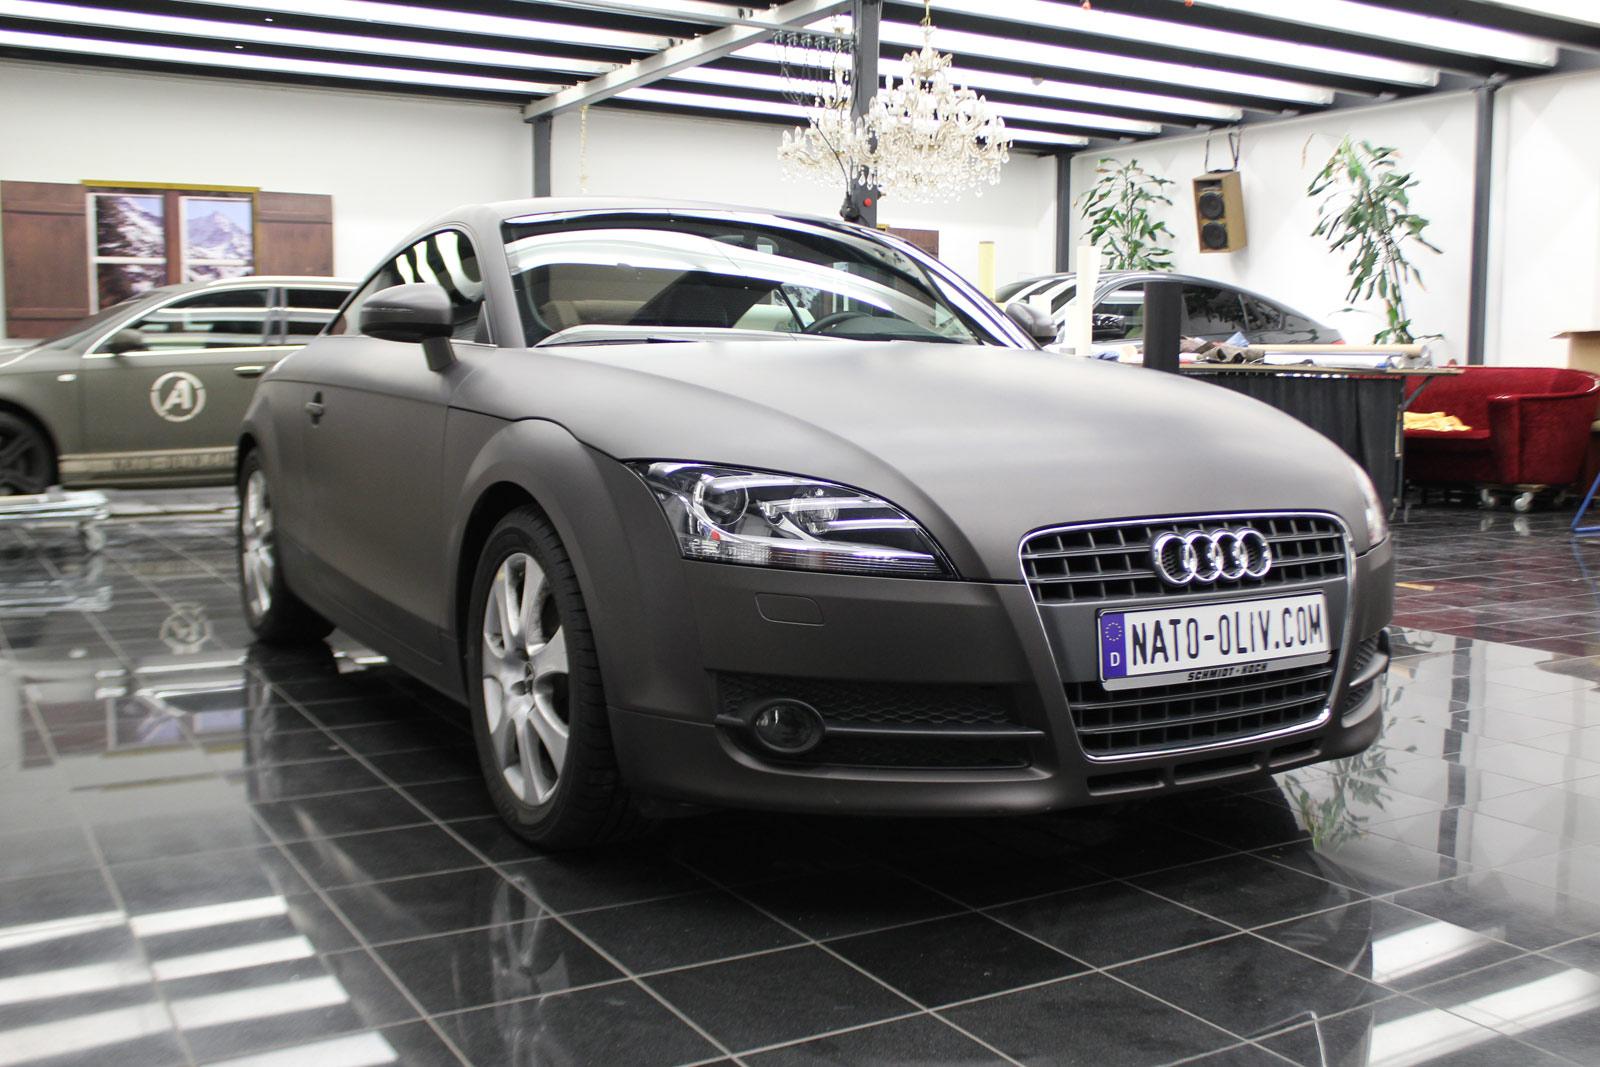 Audi_TT_Braun_Matt_Metallic_Branding_03